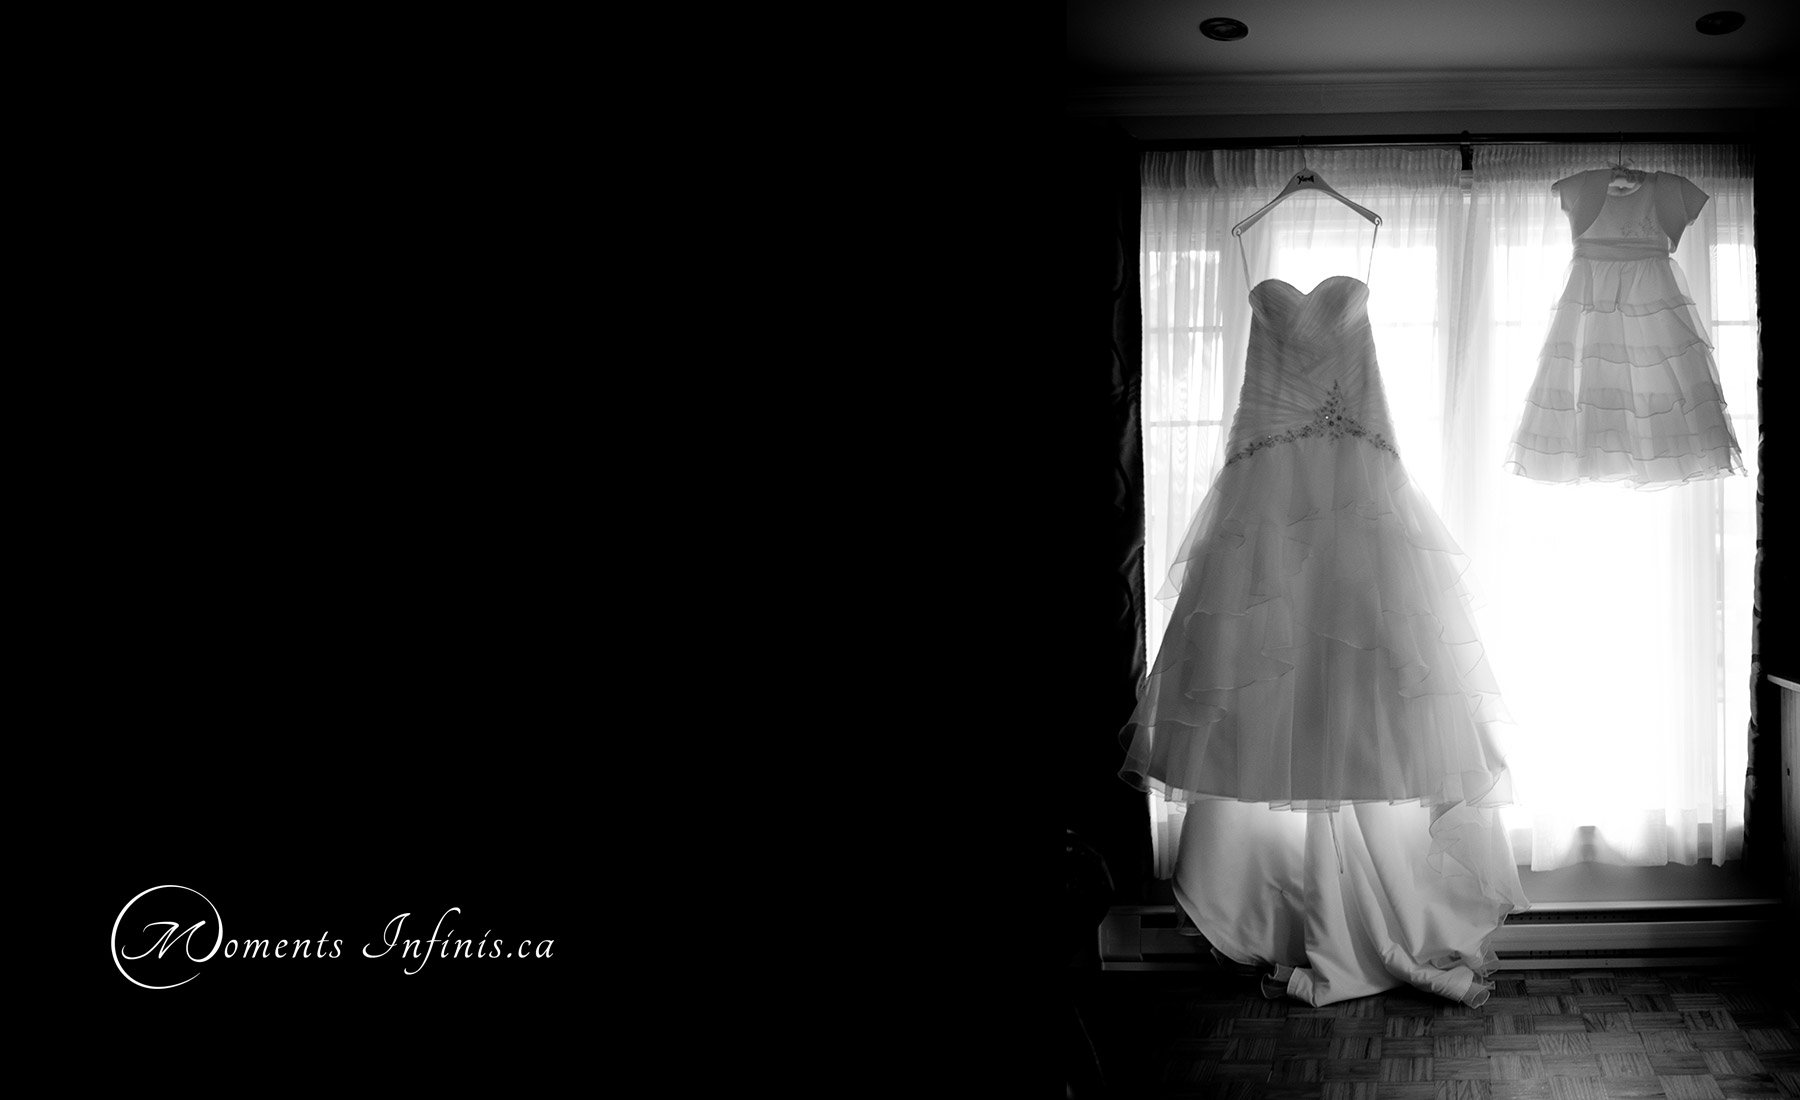 mariage_1800x1100_6